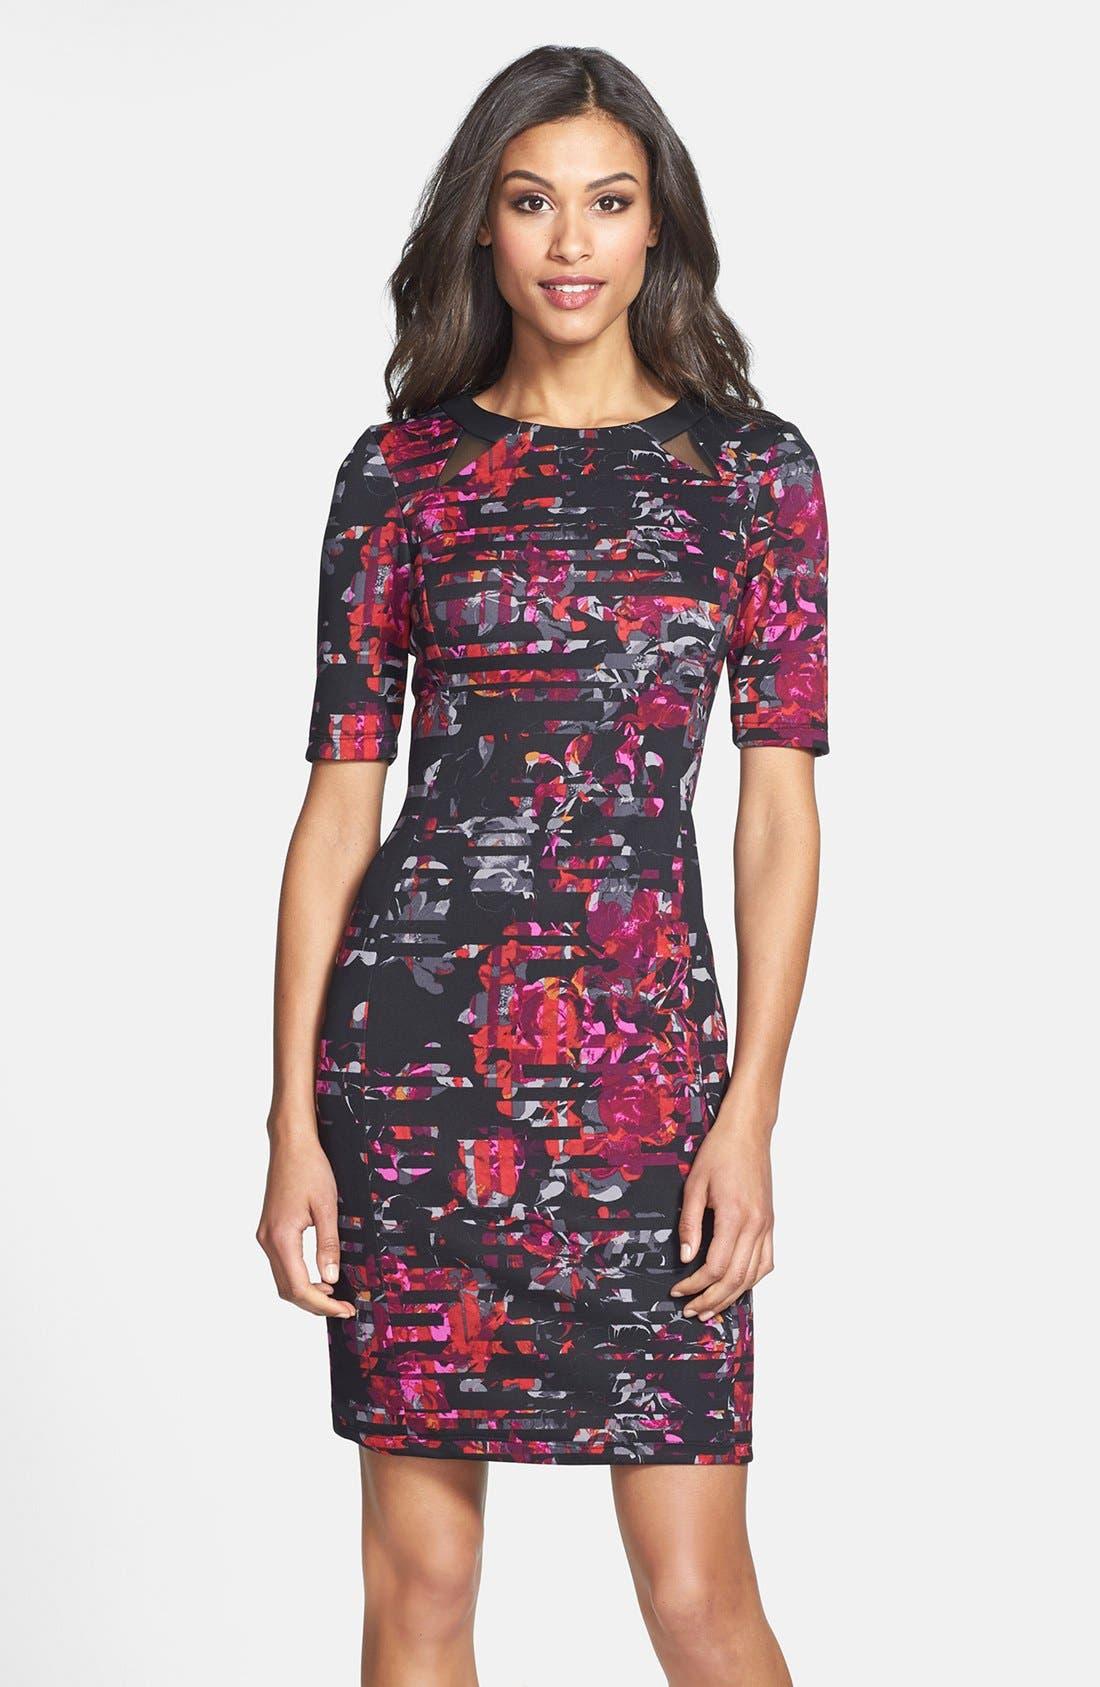 Alternate Image 1 Selected - Taylor Dresses Floral Print Scuba Sheath Dress